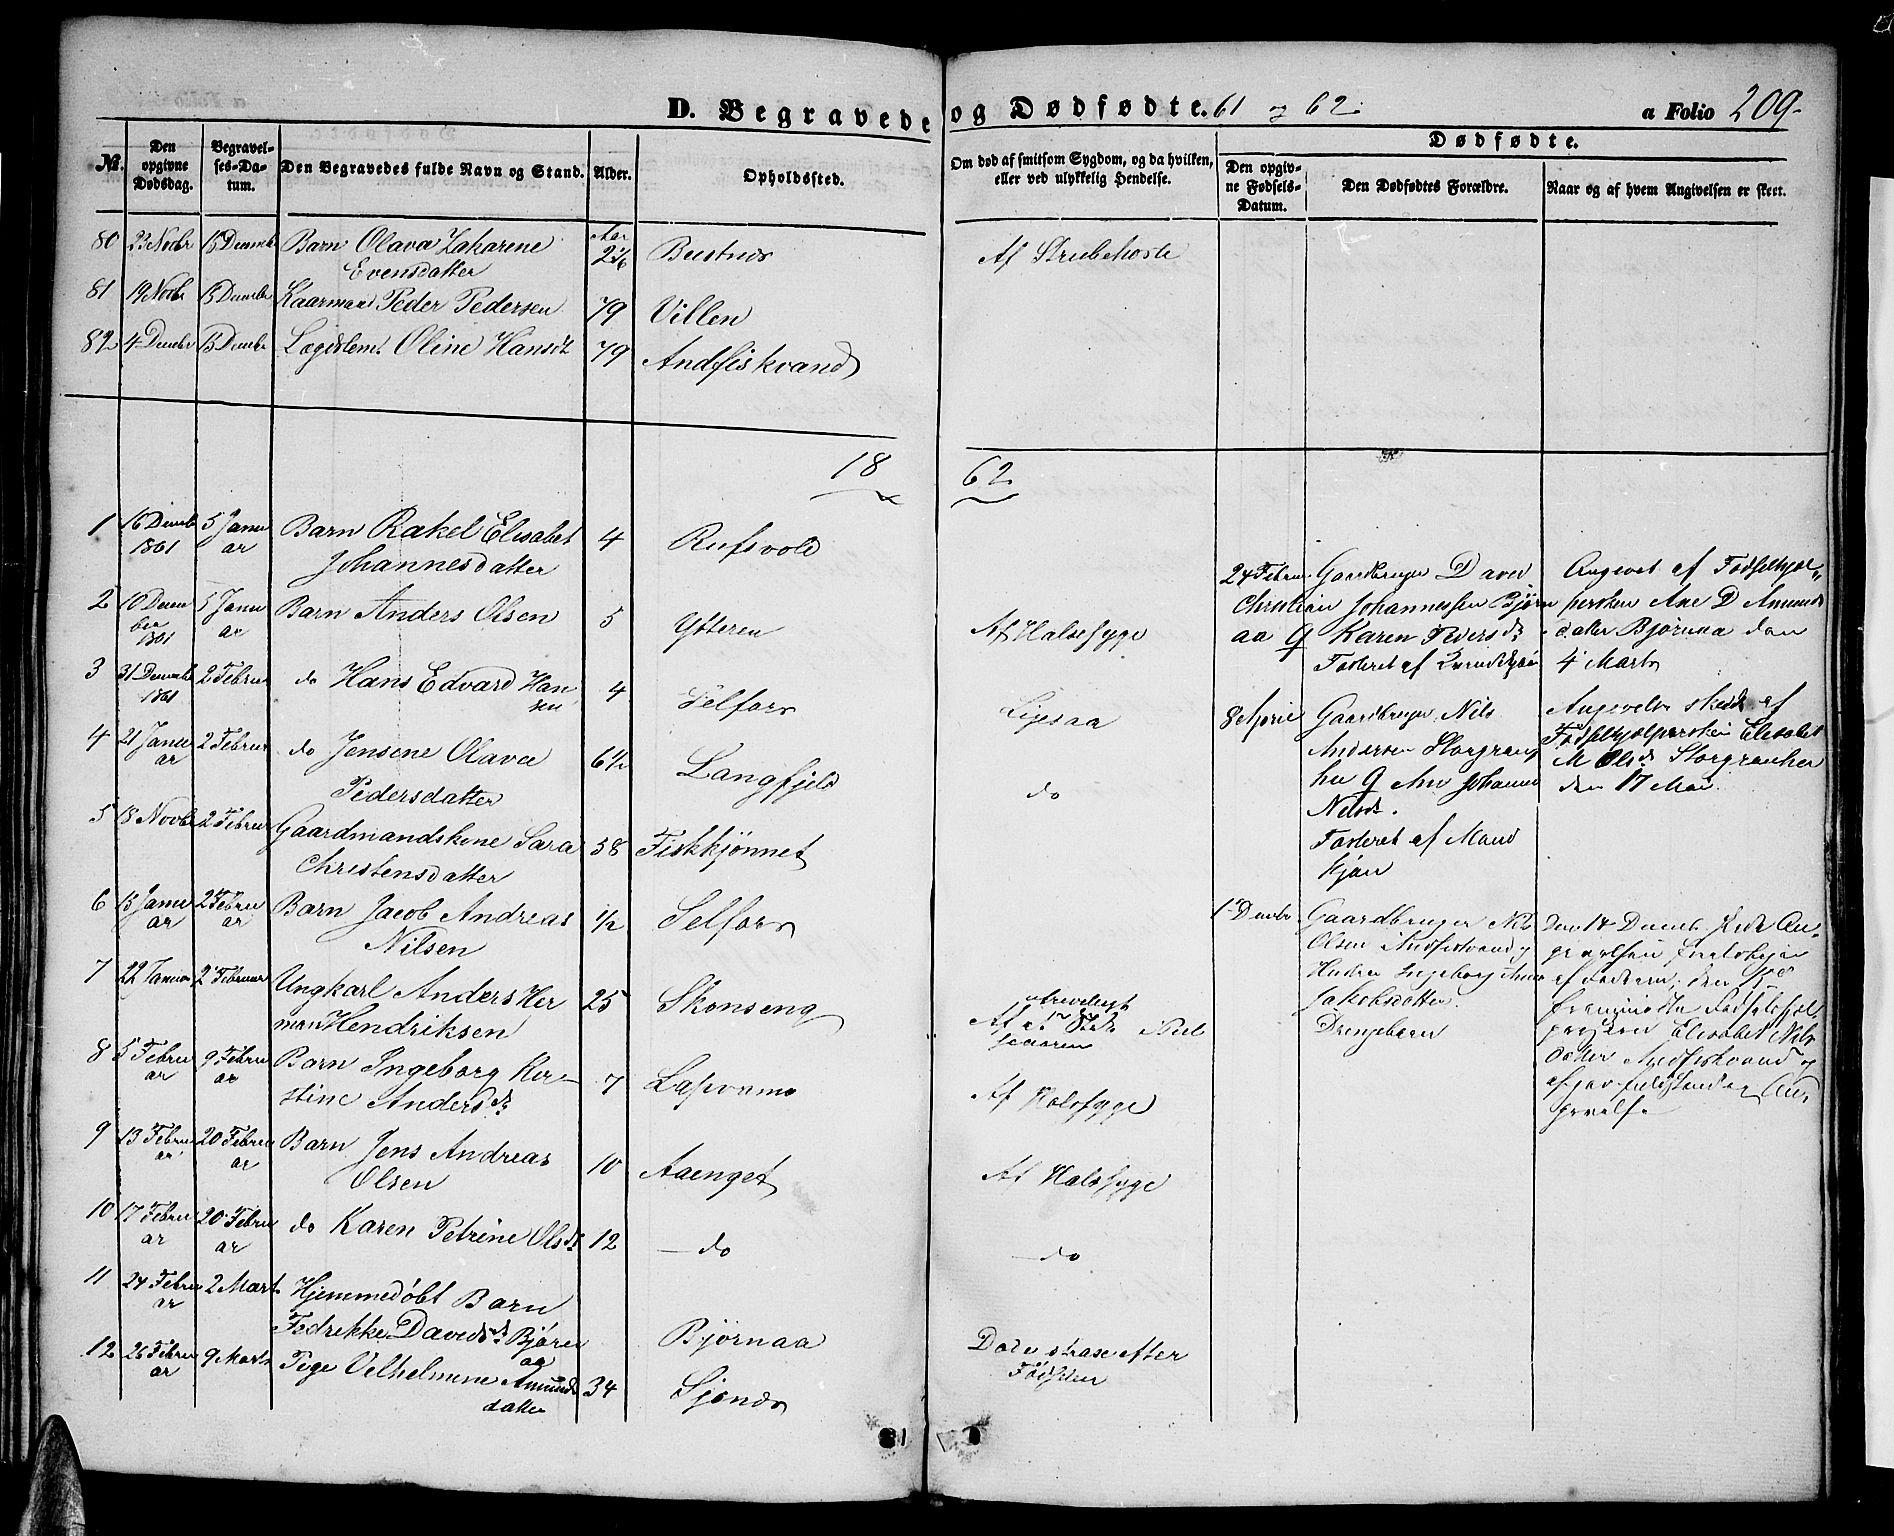 SAT, Ministerialprotokoller, klokkerbøker og fødselsregistre - Nordland, 827/L0414: Klokkerbok nr. 827C03, 1853-1865, s. 209